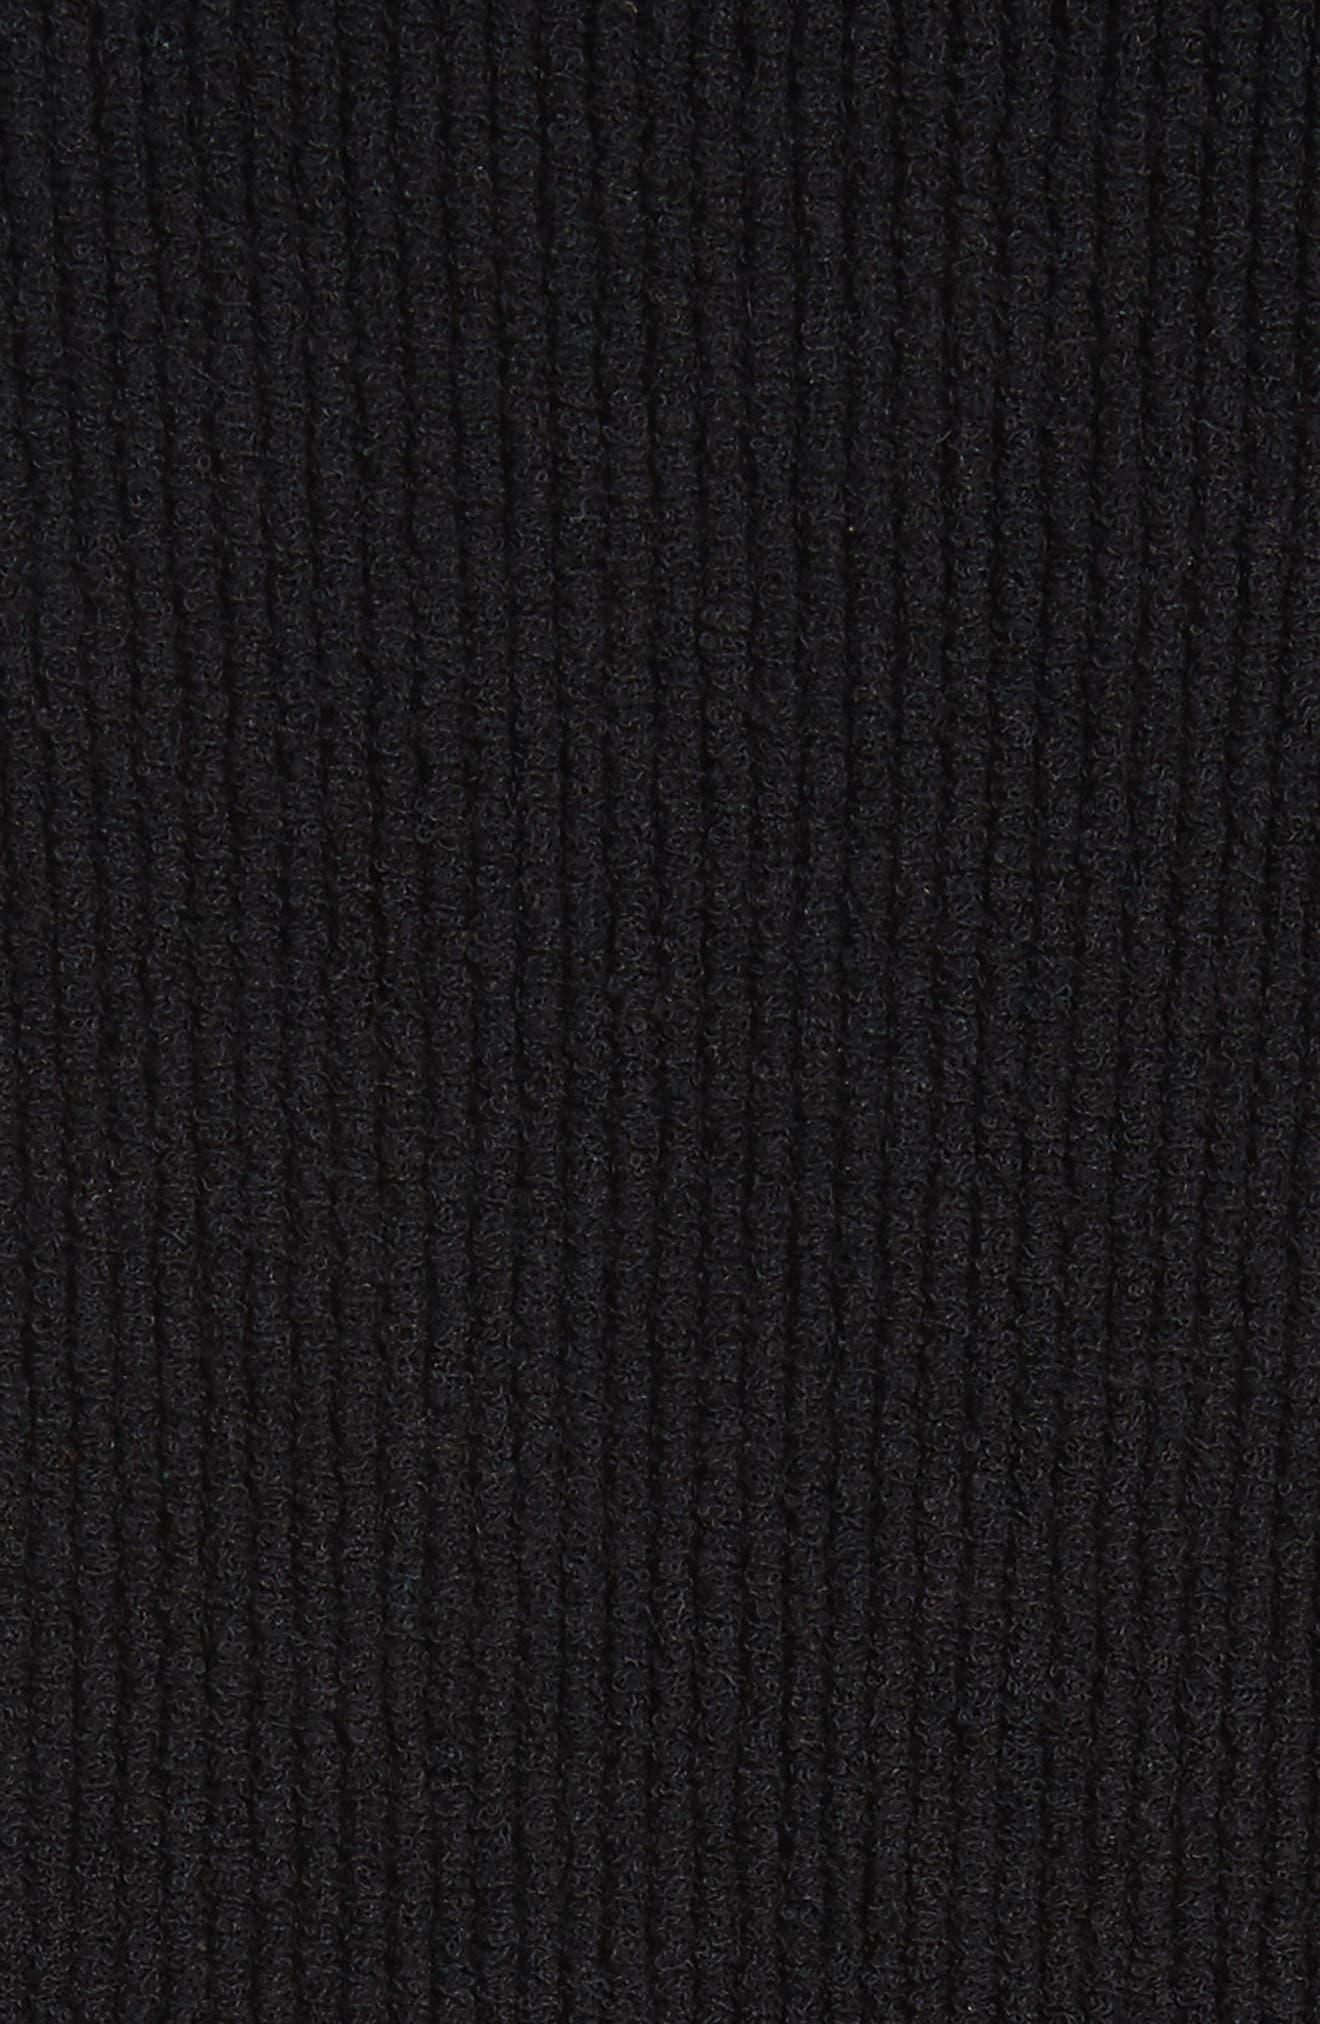 Ottoman Slouchy Tunic,                             Alternate thumbnail 5, color,                             BLACK